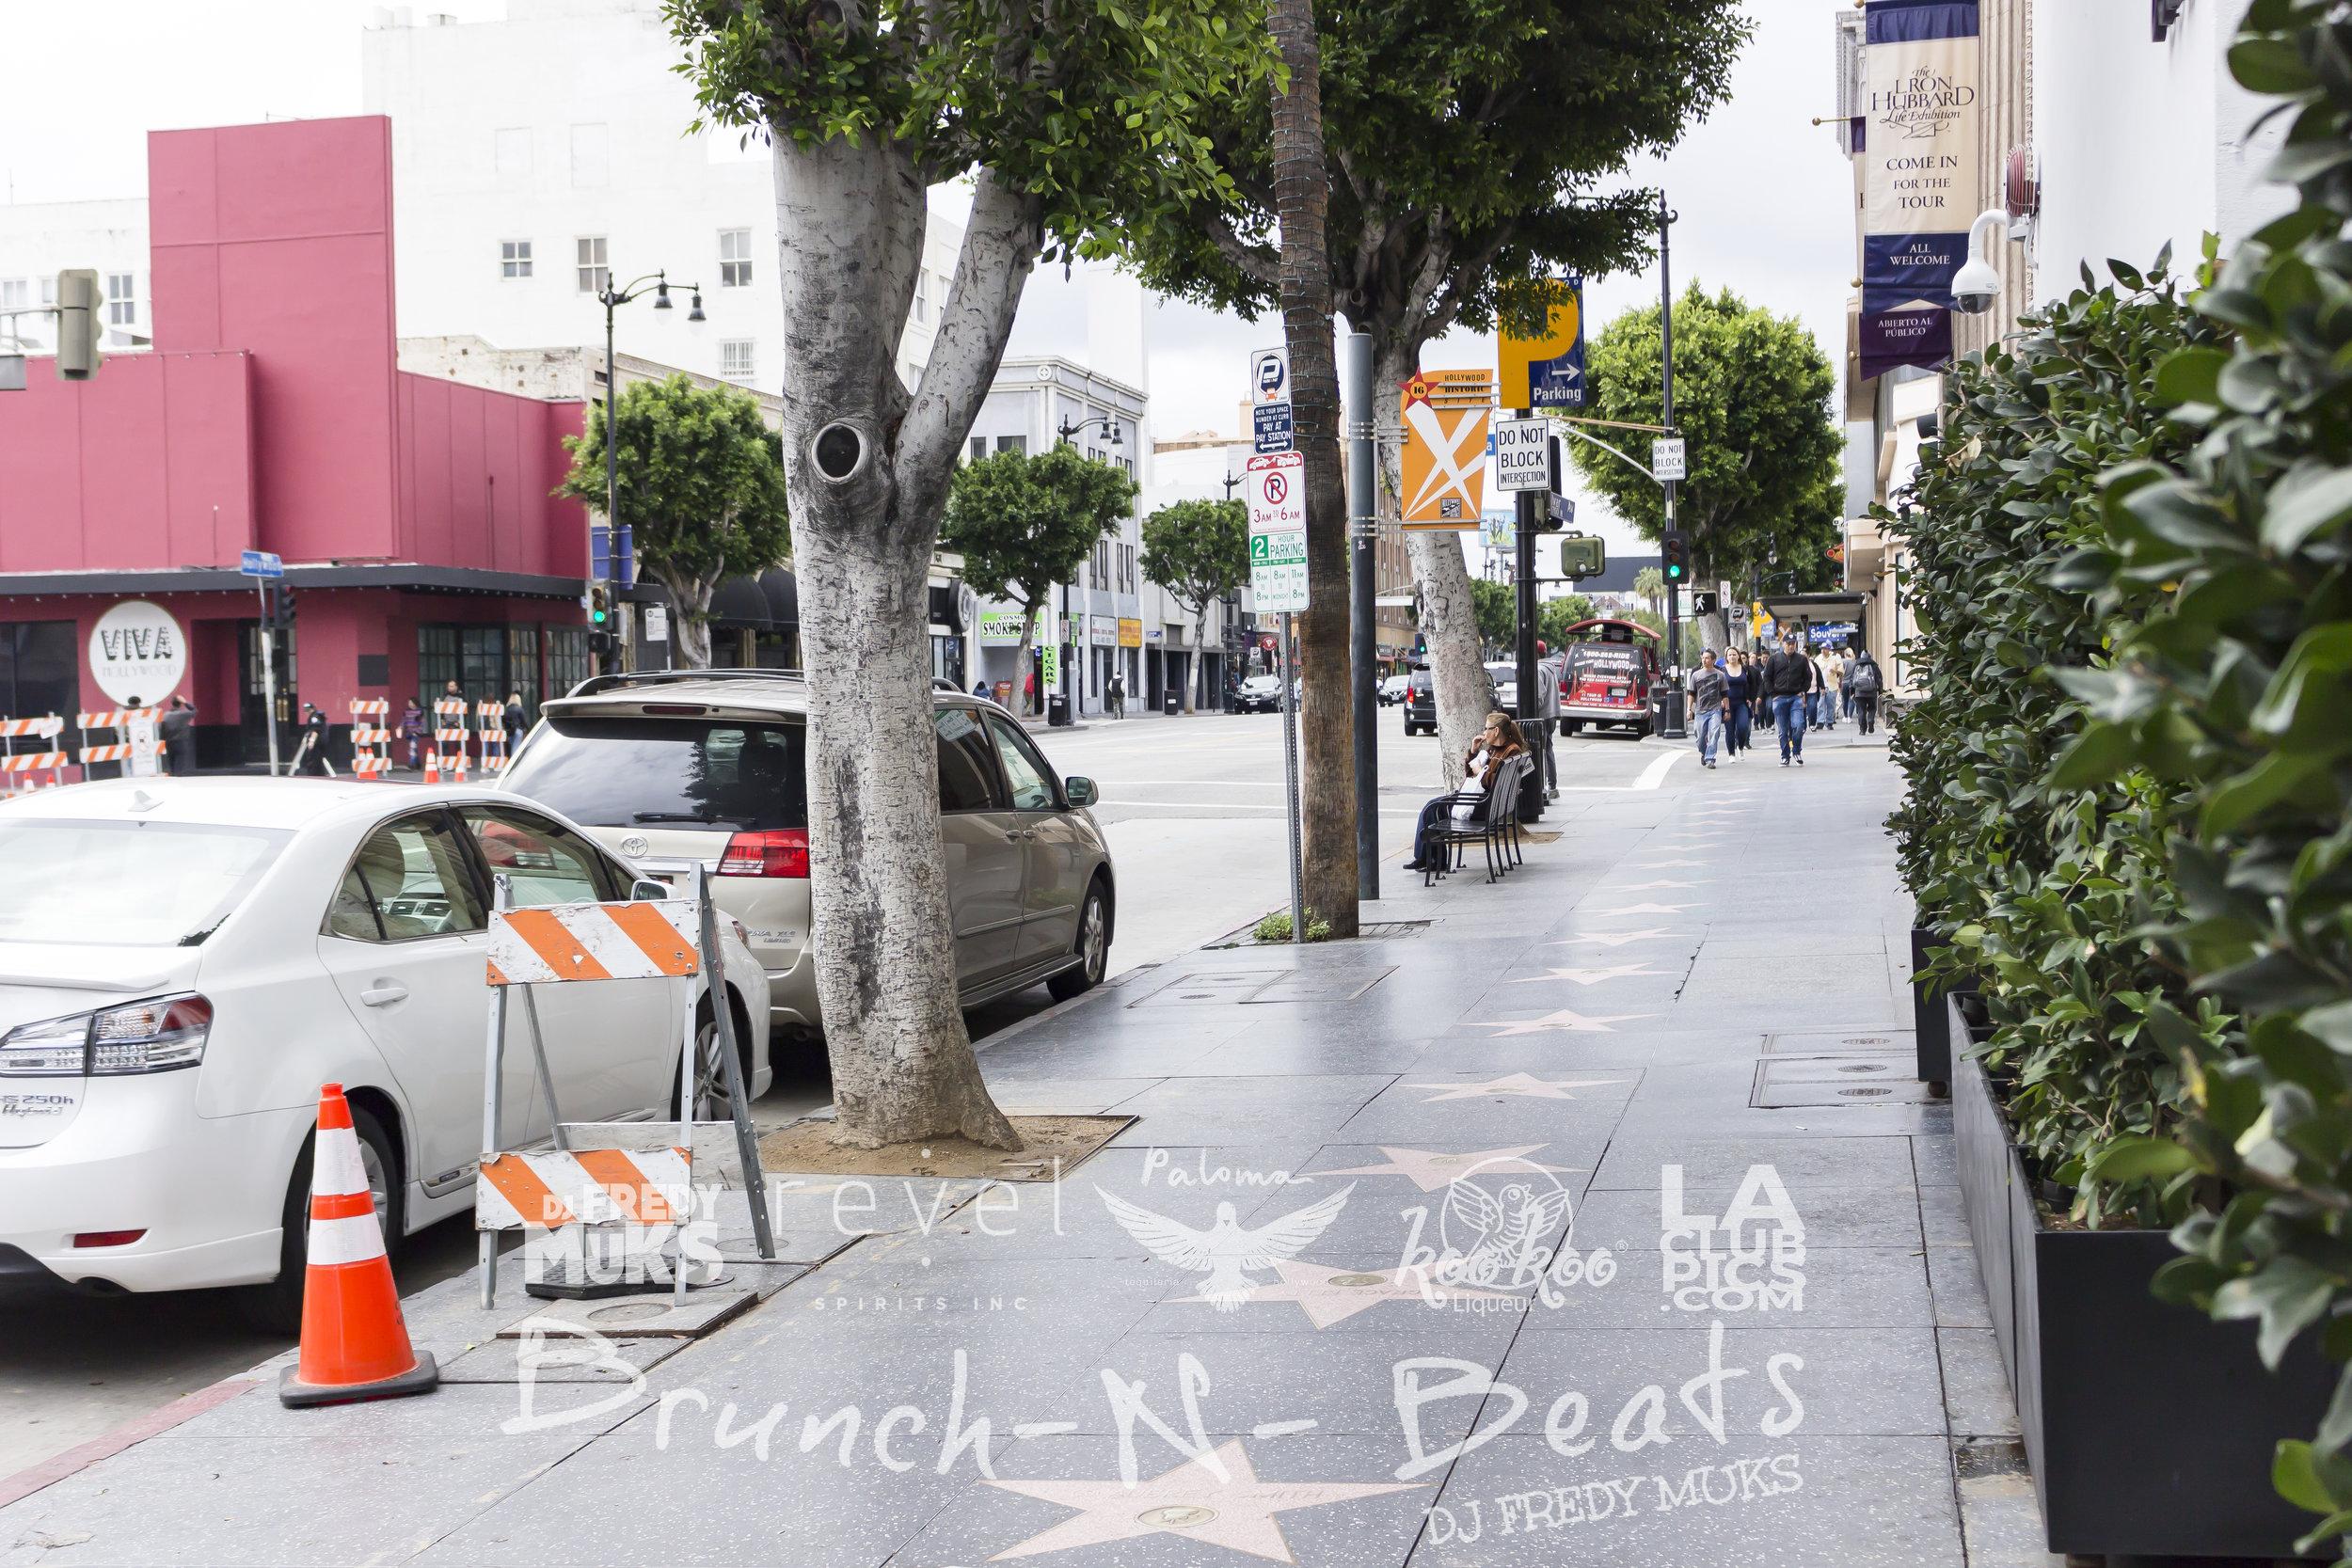 Brunch-N-Beats - 03-11-18_77.jpg